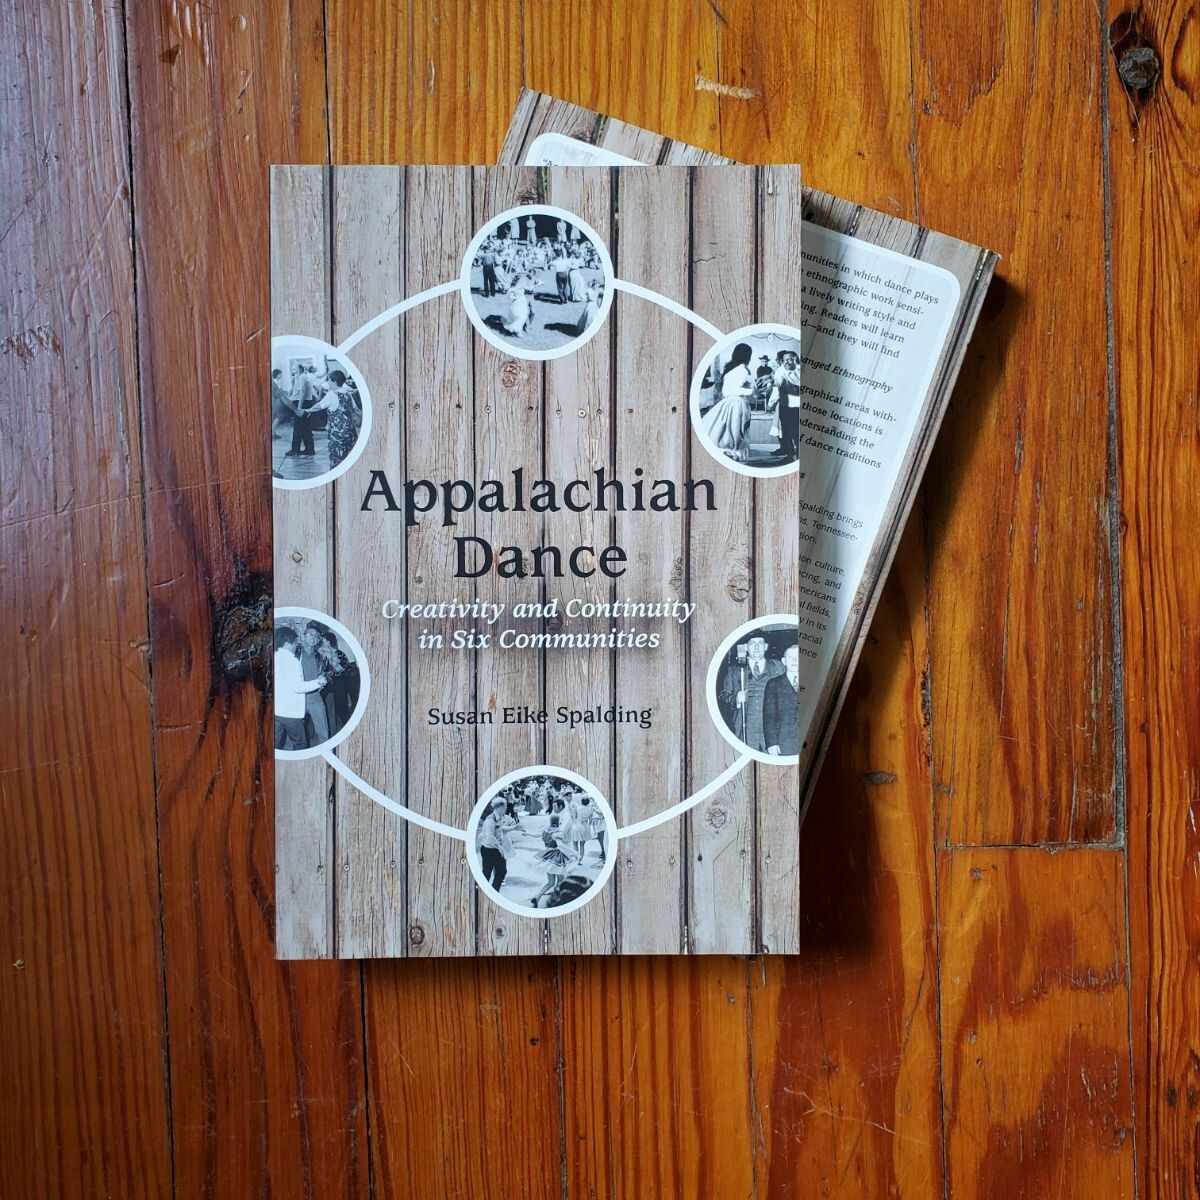 Appalachian Dance by: Susan Spalding